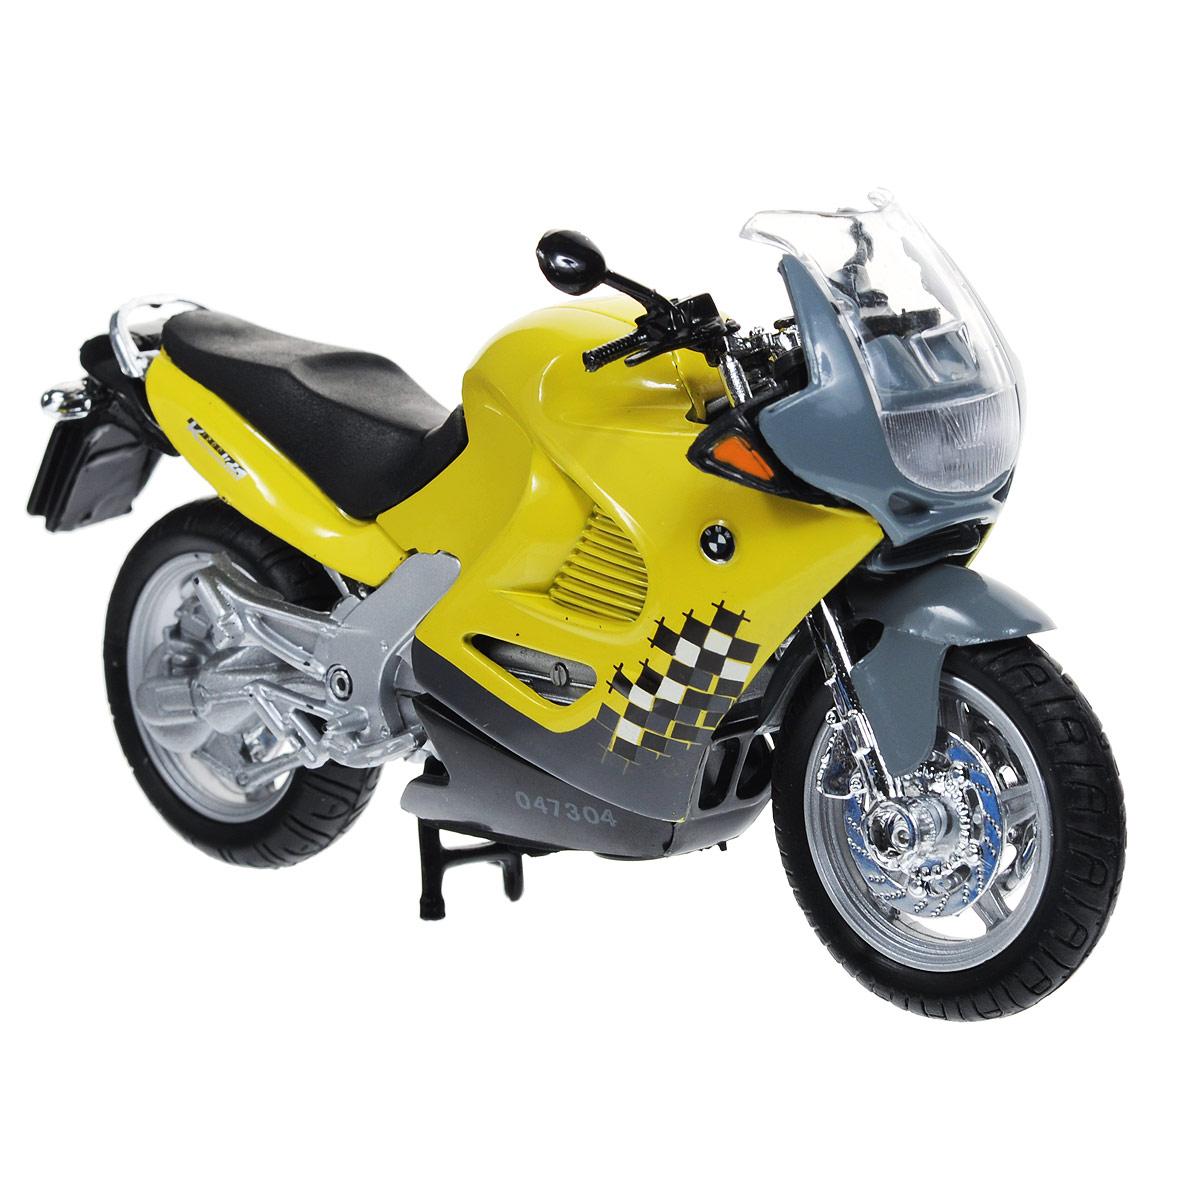 Autotime Коллекционная модель мотоцикла BMW K1200RS, цвет: желтый, серый. Масштаб 1/18 autotime коллекционная модель автомобиля saleen s7 цвет оранжевый масштаб 1 18